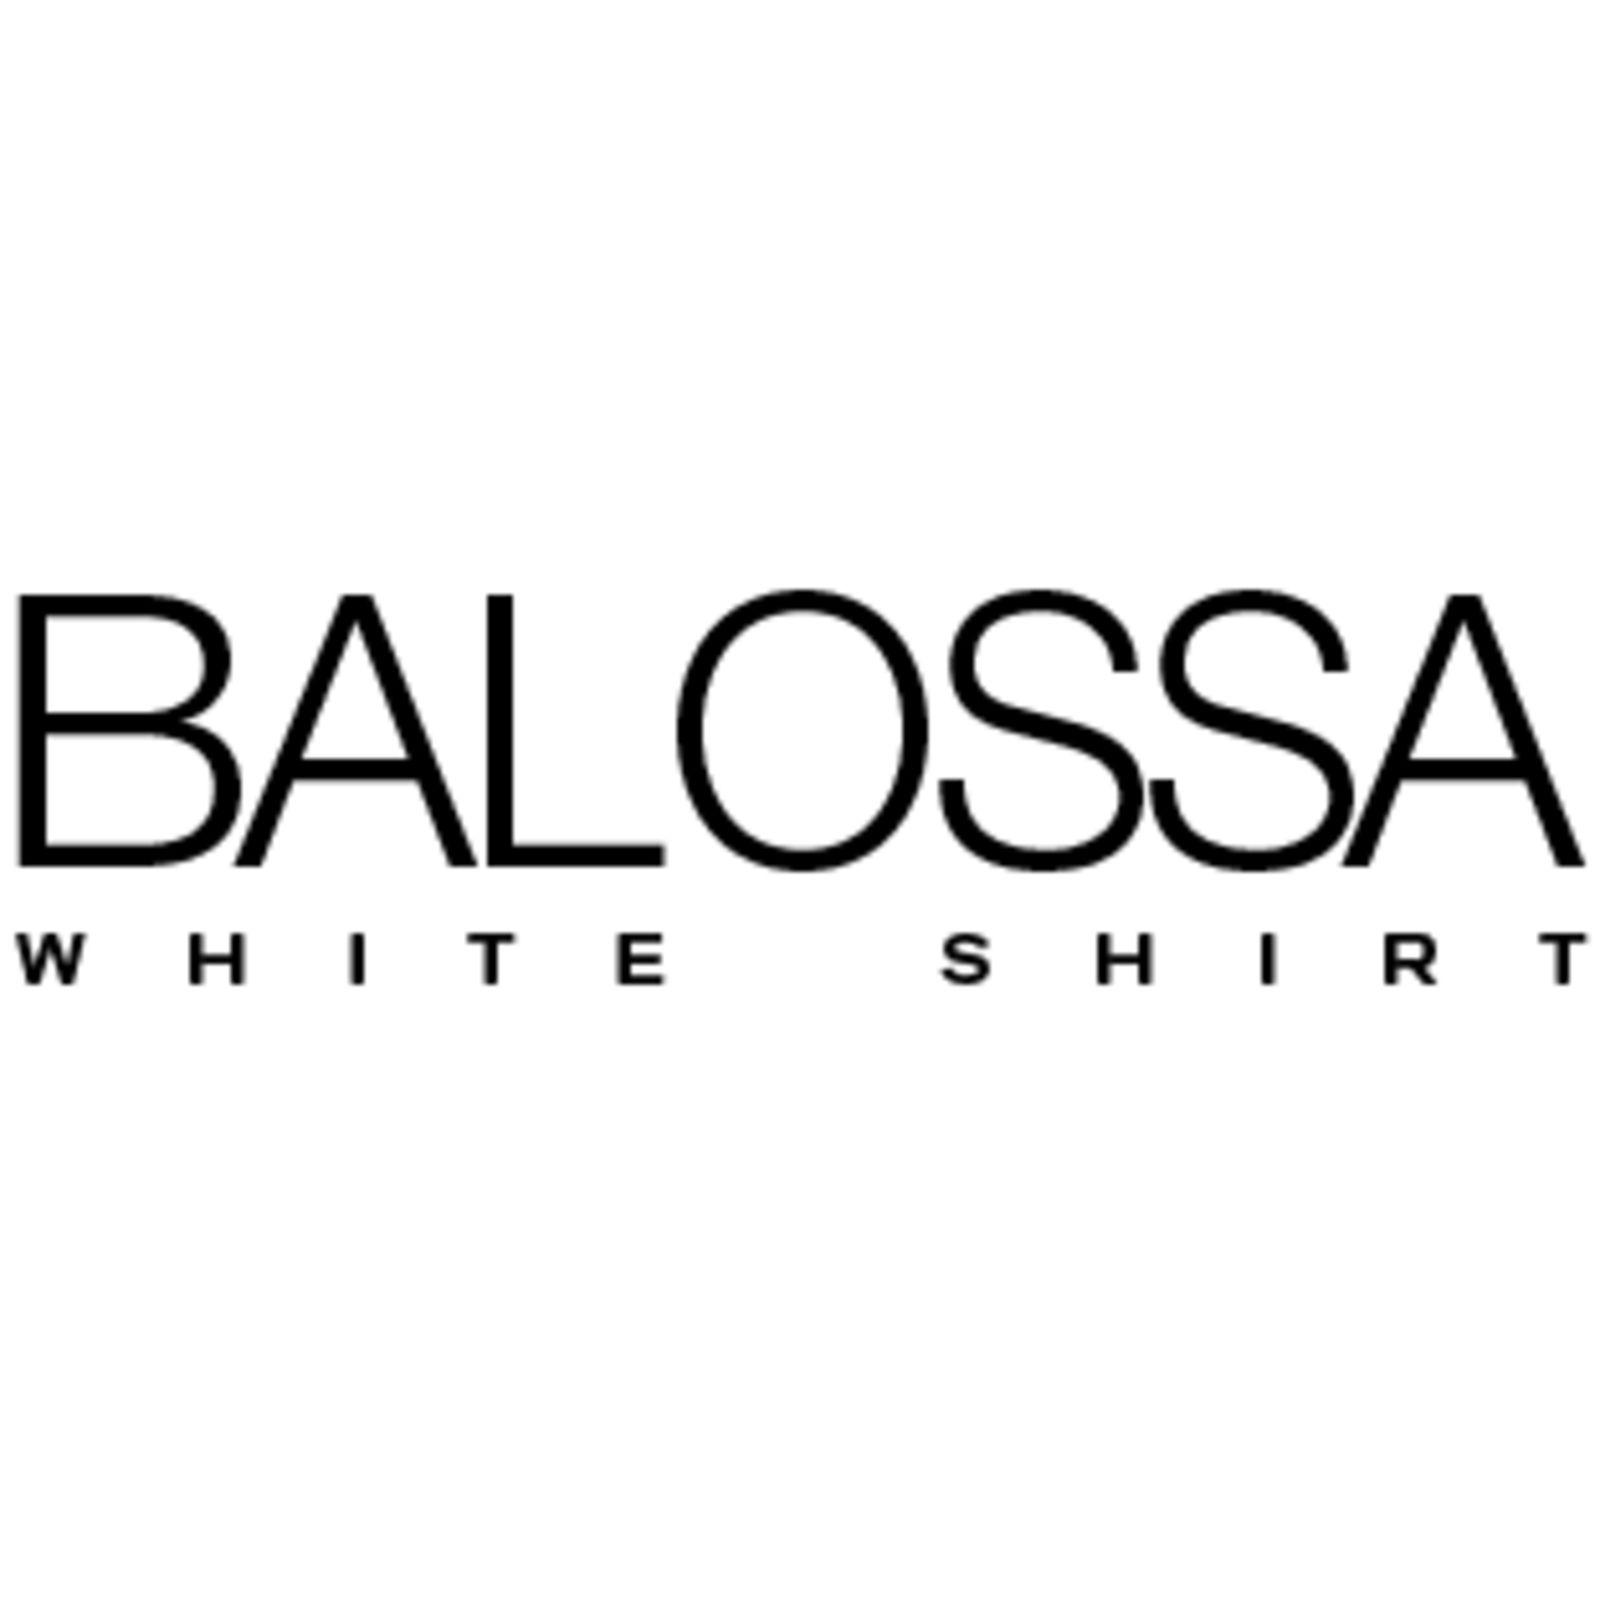 BALOSSA